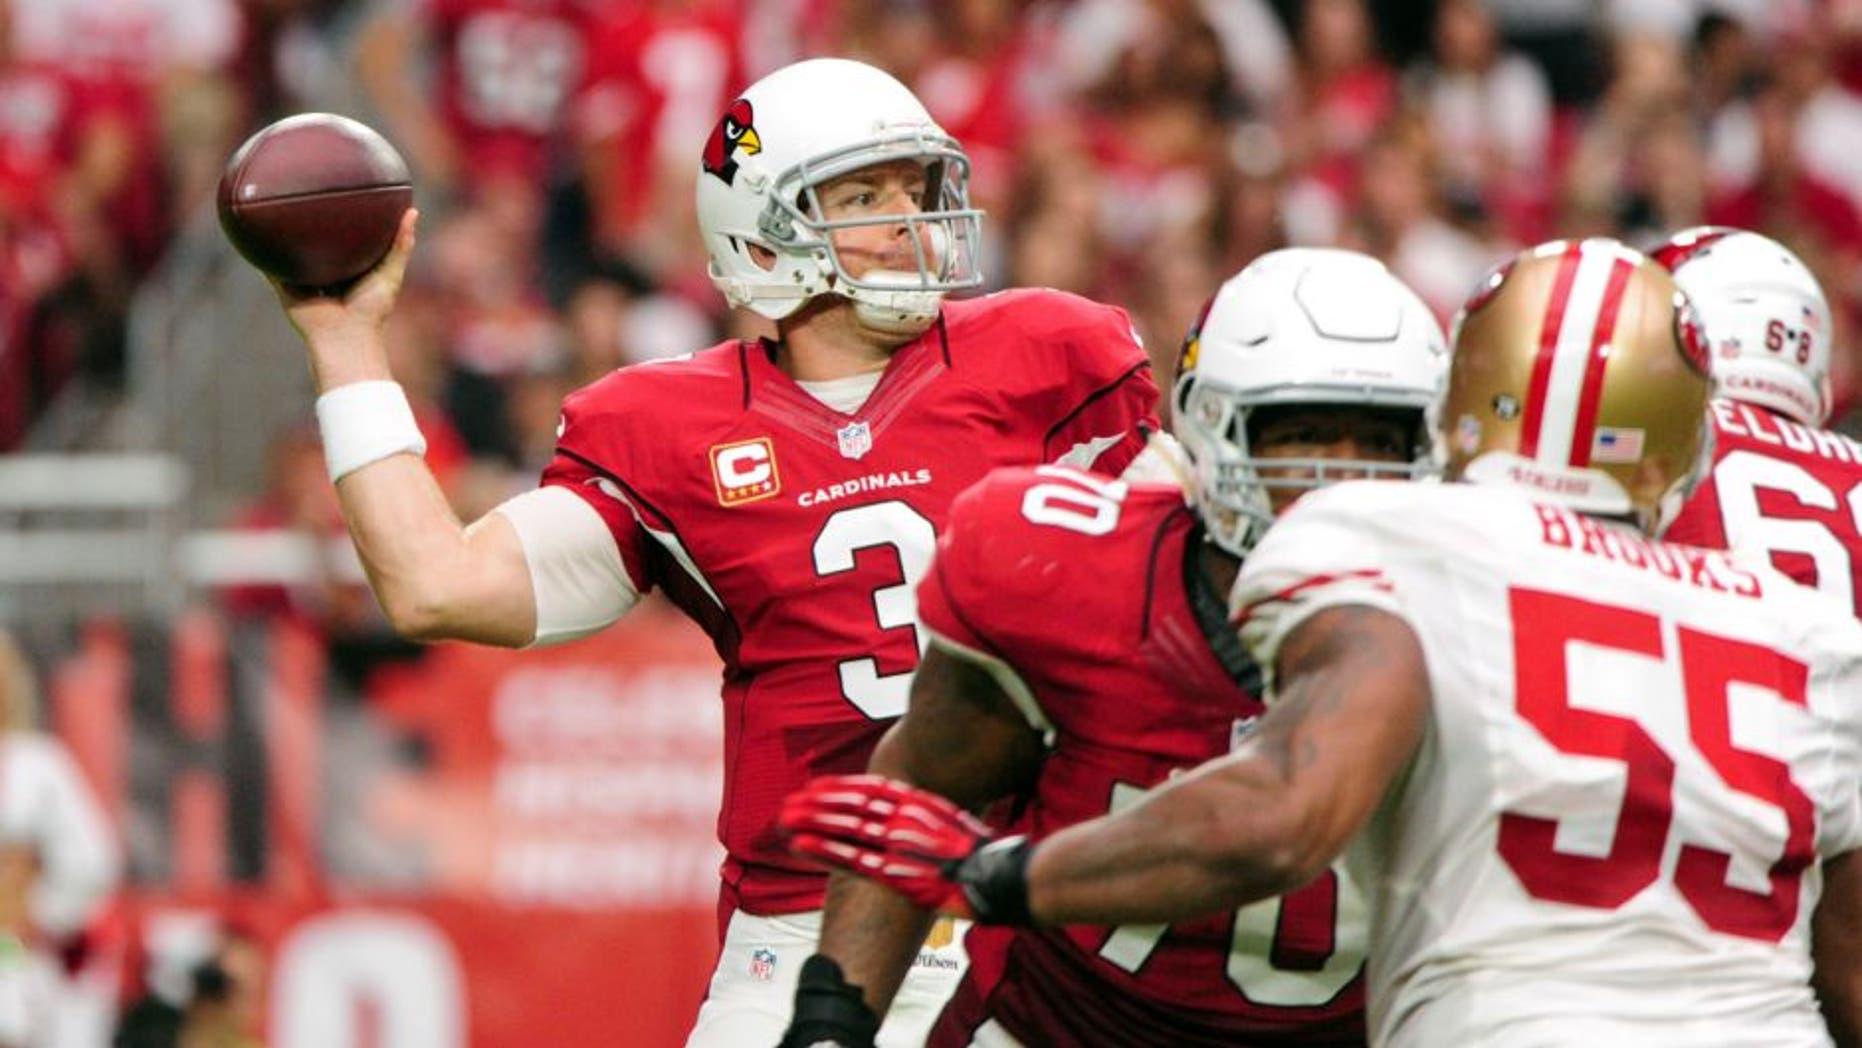 Sep 27, 2015; Glendale, AZ, USA; Arizona Cardinals quarterback Carson Palmer (3) throws during the first half against the San Francisco 49ers at University of Phoenix Stadium. Mandatory Credit: Matt Kartozian-USA TODAY Sports